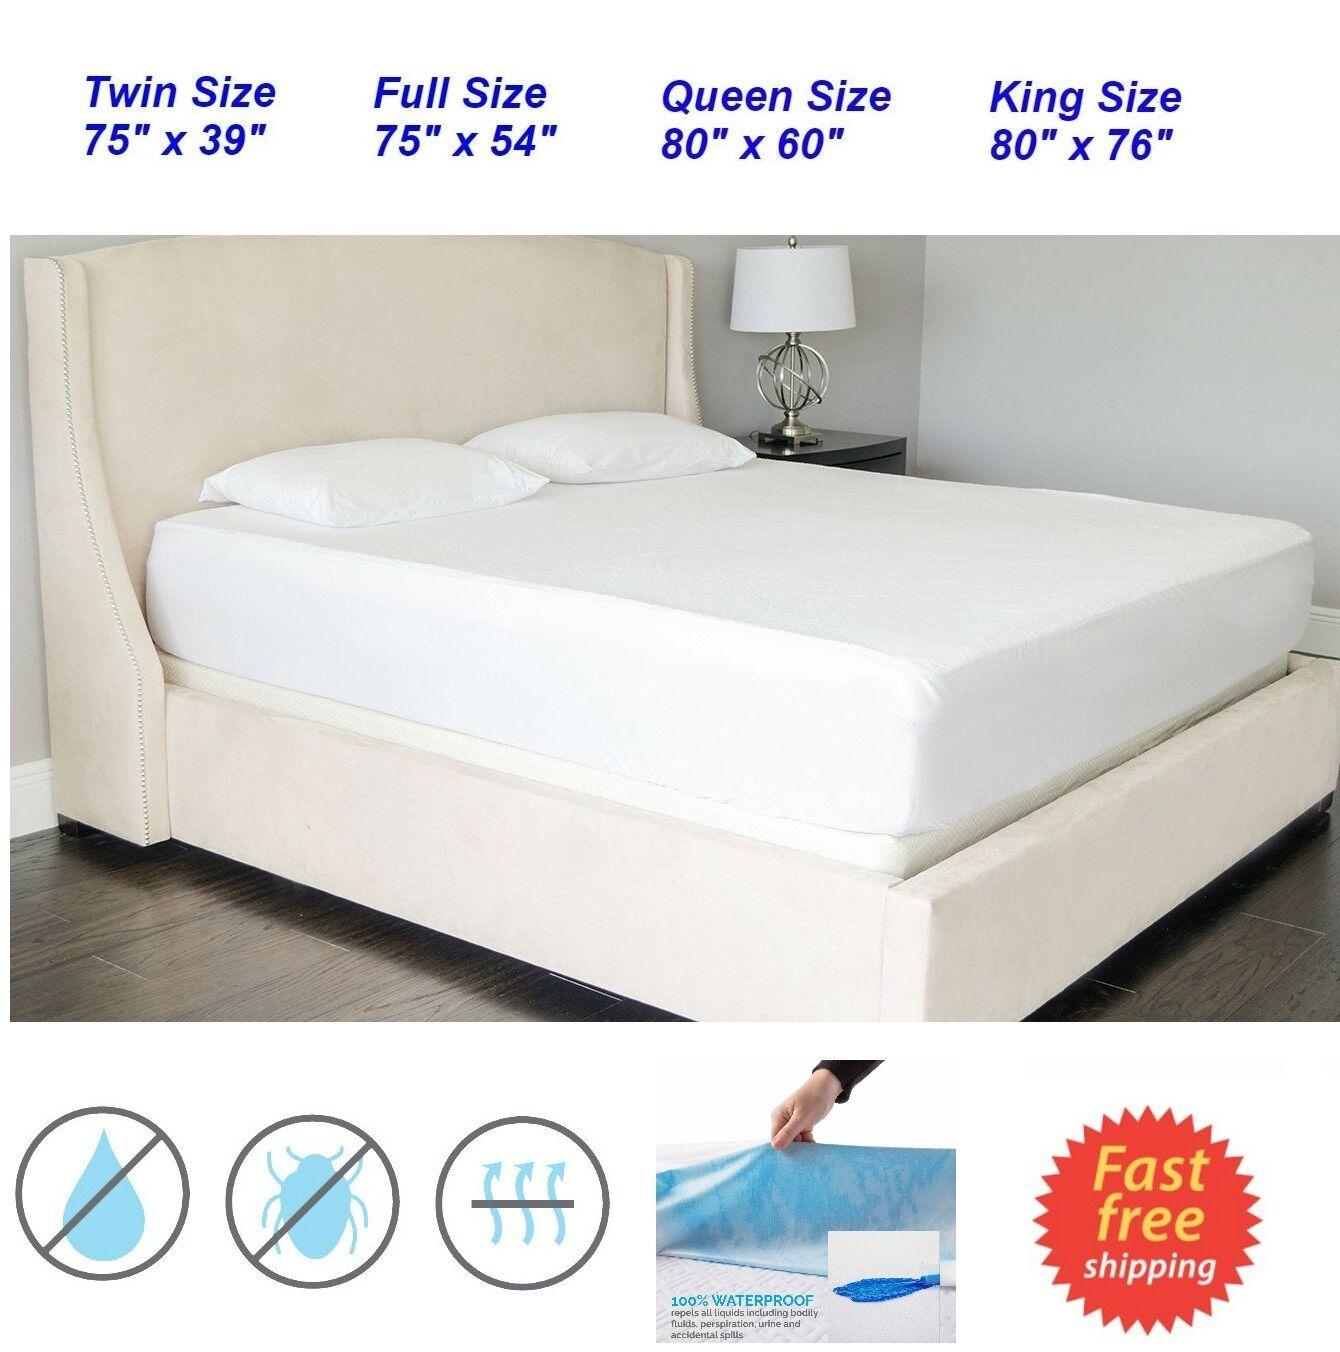 king mattress topper - soft & quiet waterproof mattress bed protector cover  king queen full size topper